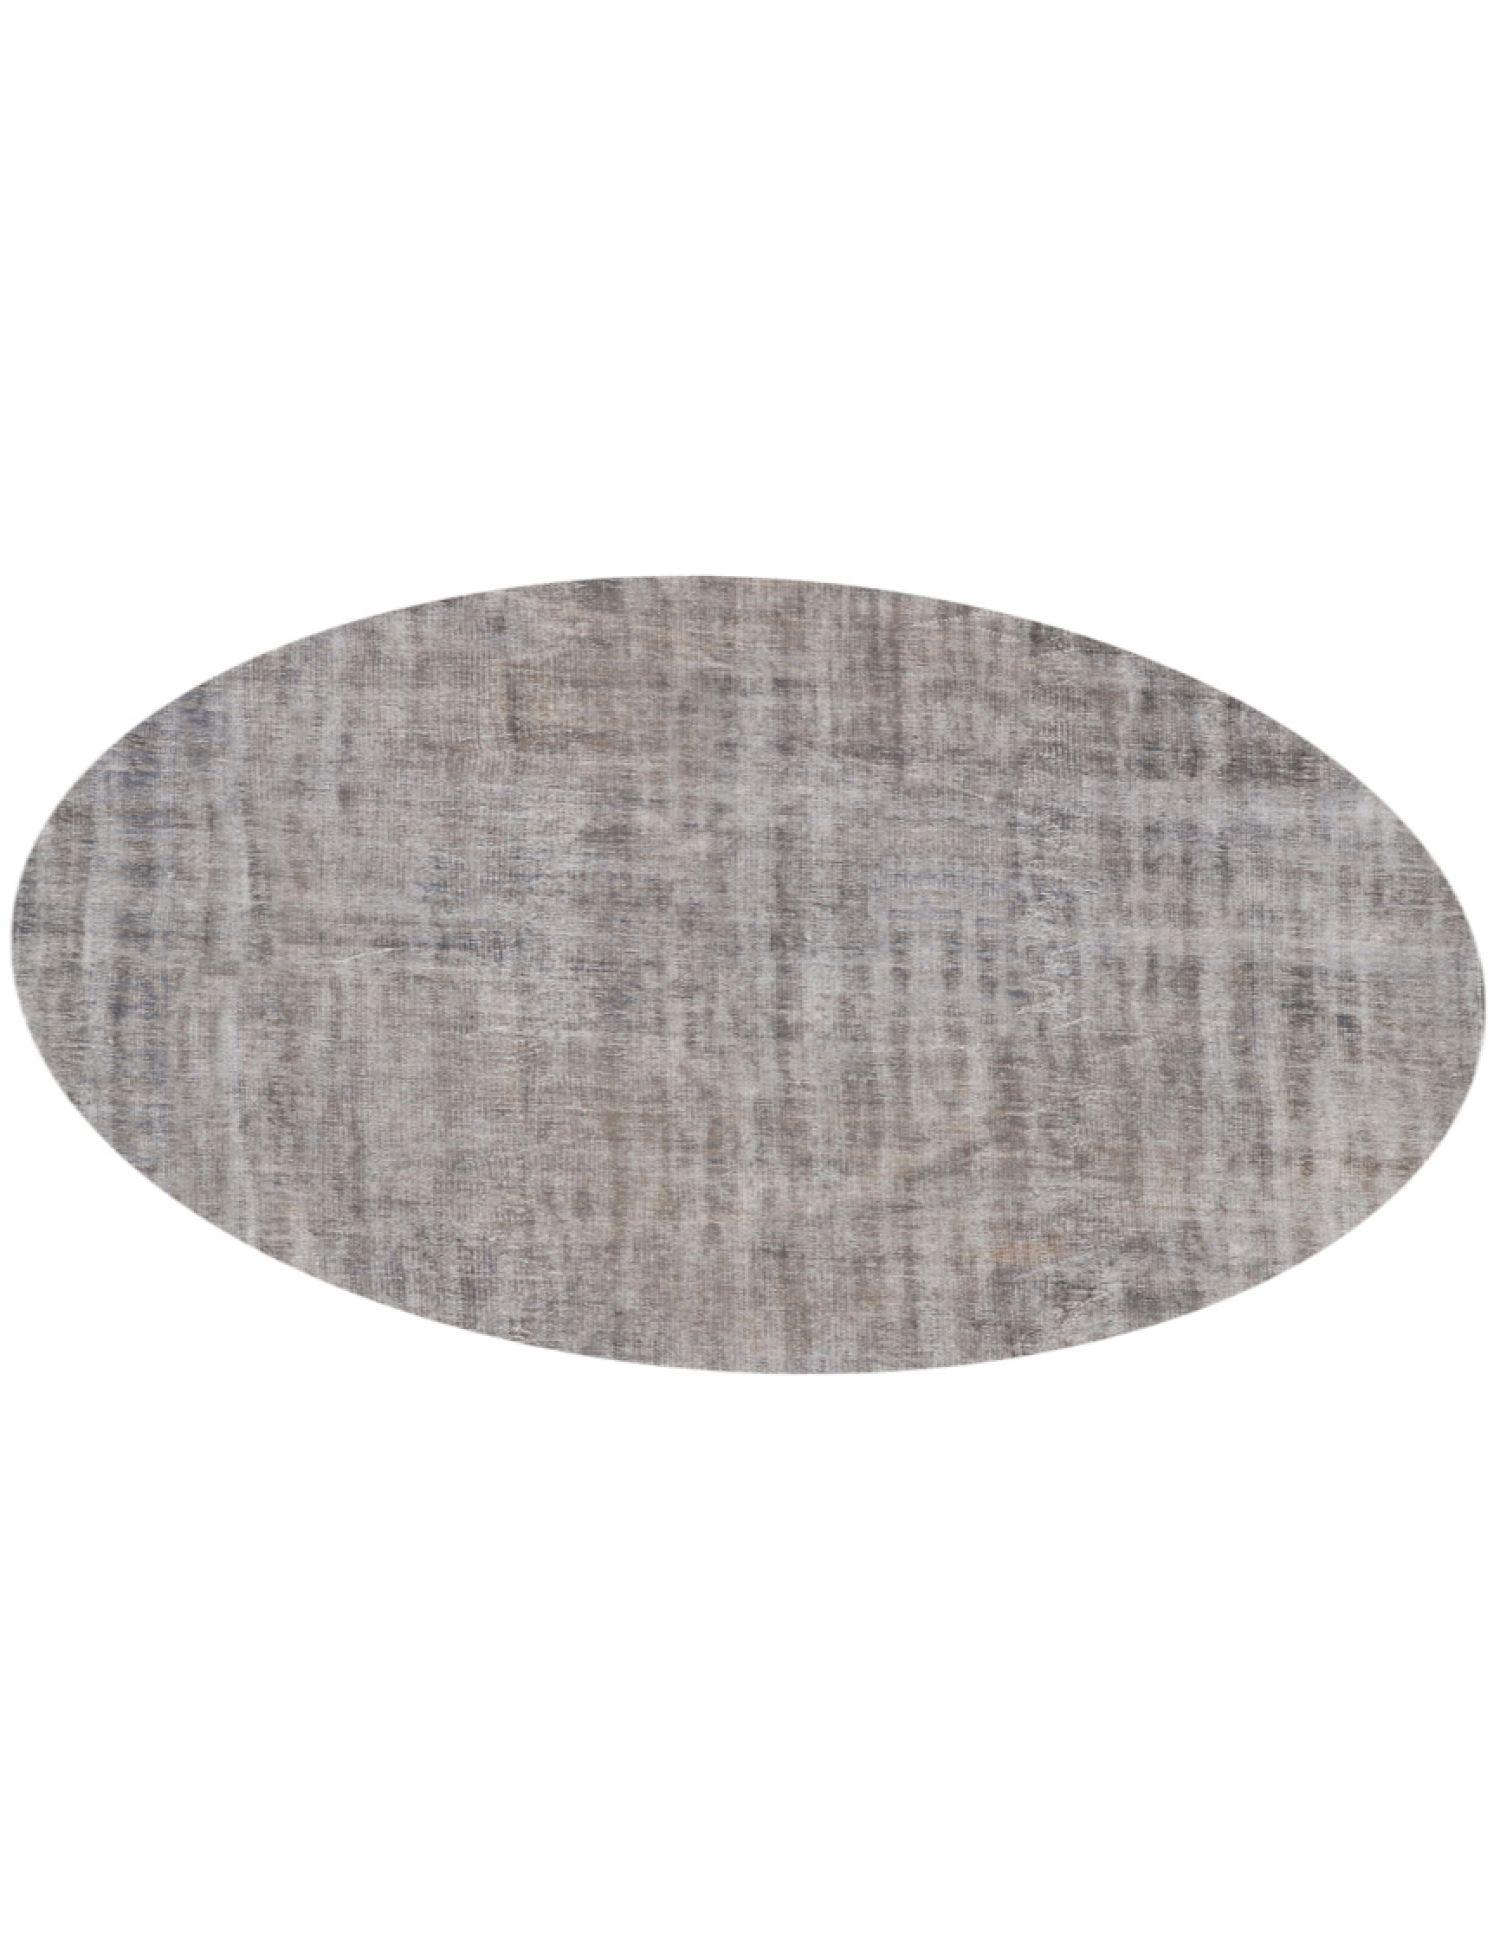 Tappeto Vintage  grigio <br/>250 x 250 cm